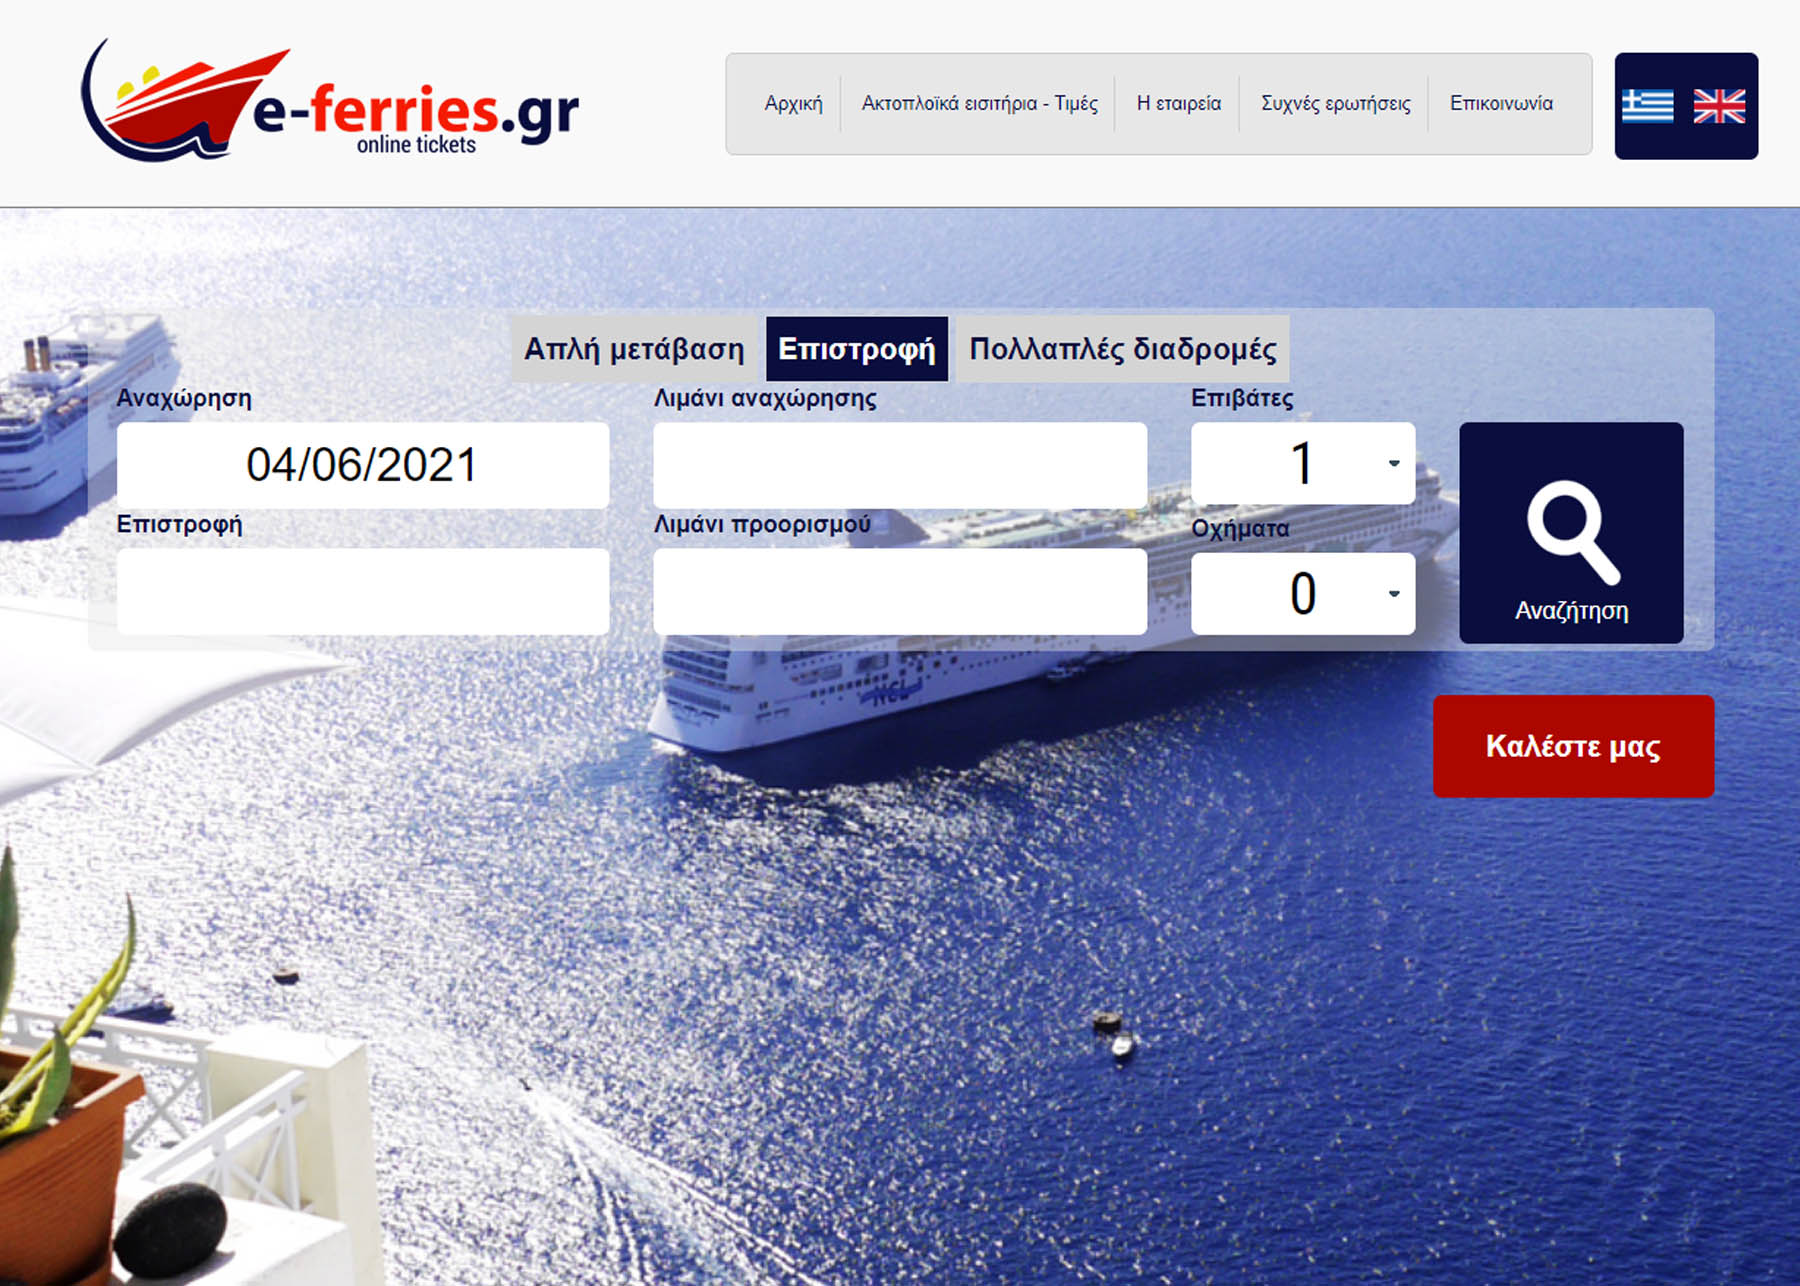 e-ferries